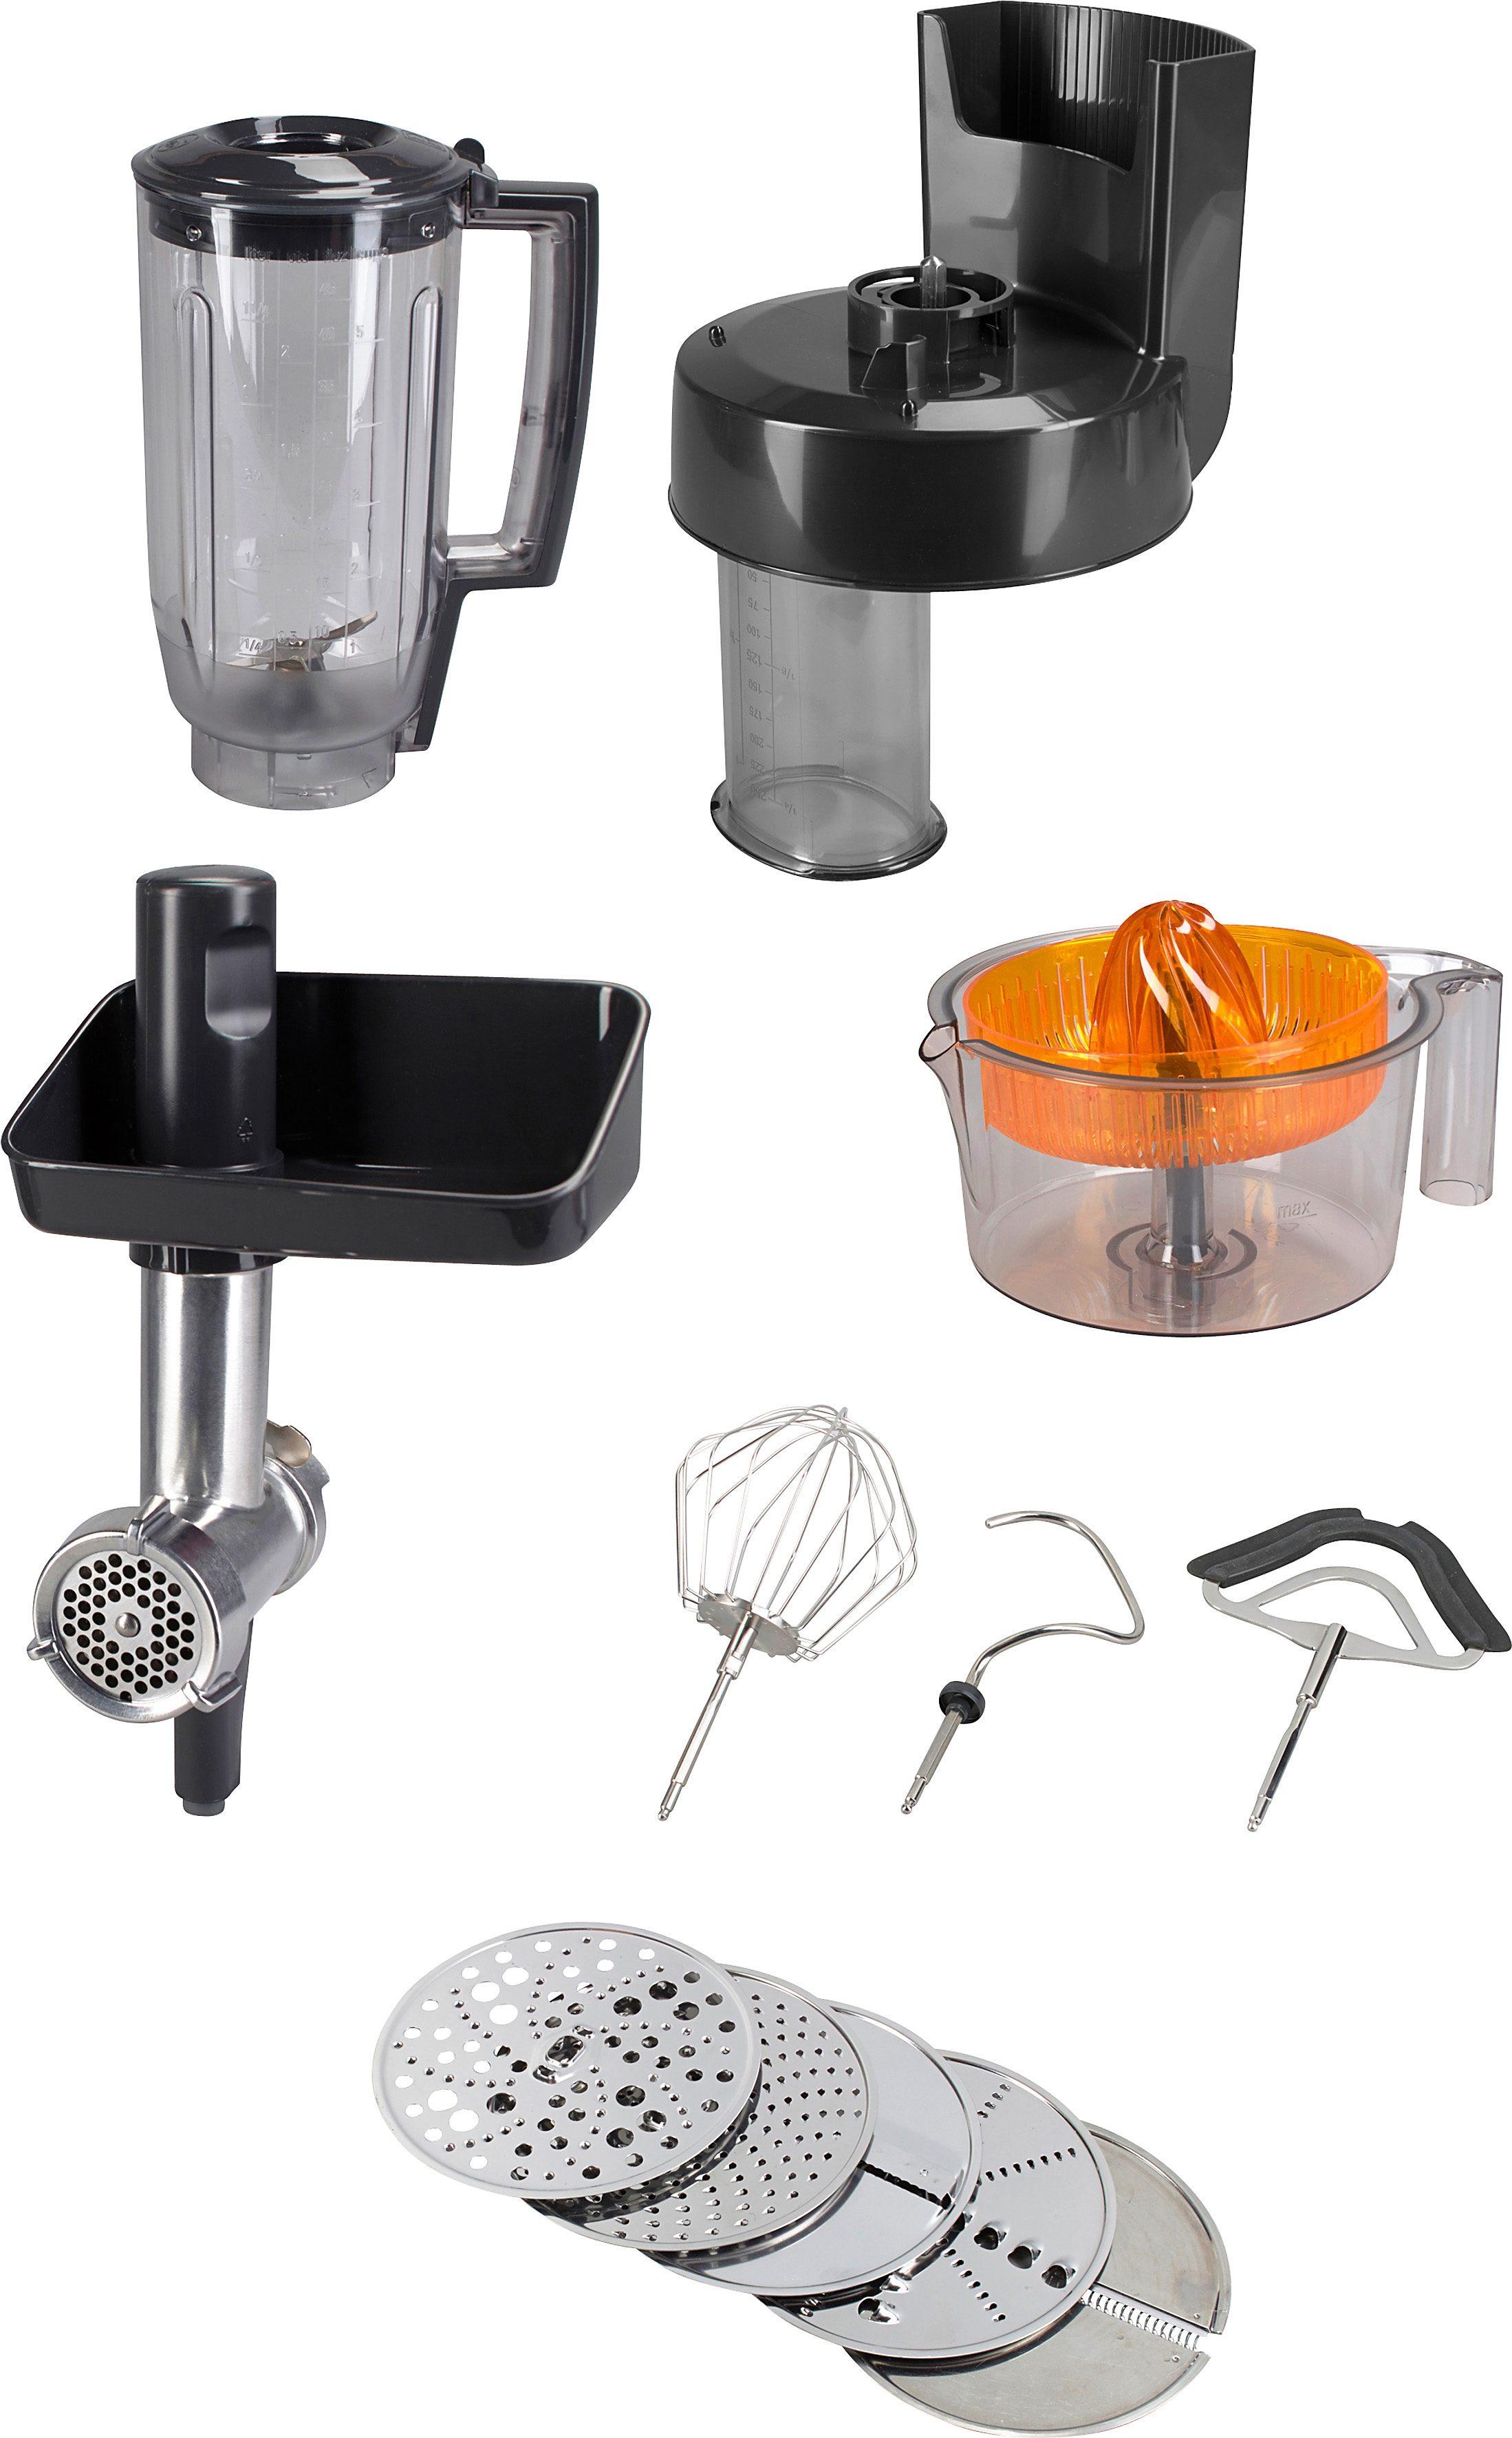 Kuchenmaschine Bosch Mum 57860 900w Ebay